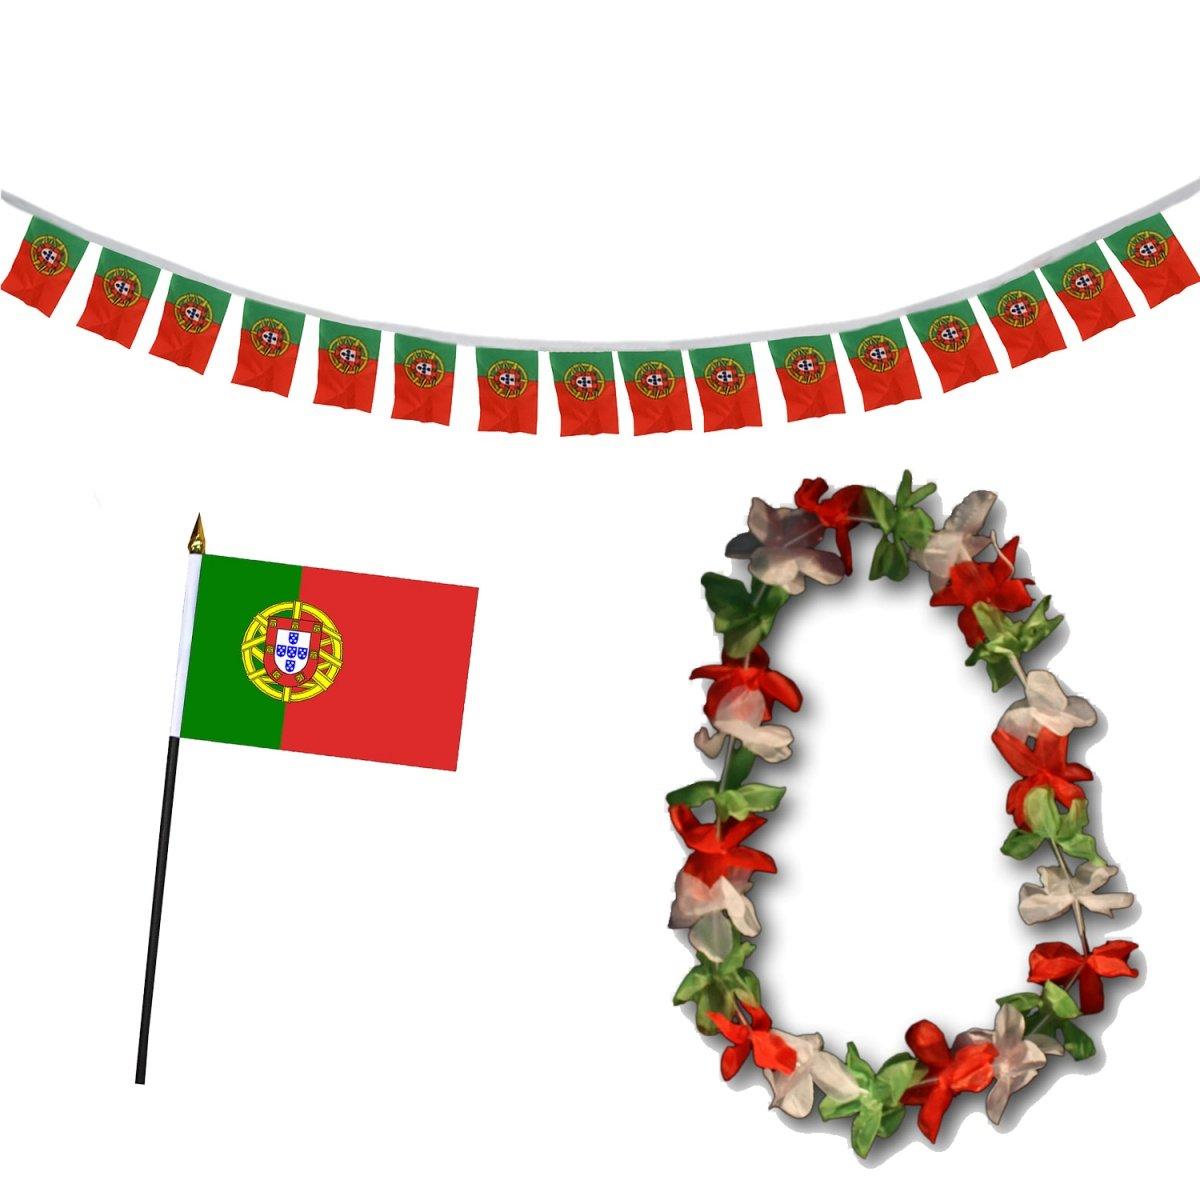 Sonia Originelli Fan-Paket-9 WM EM Fußball Fan Girlande Mini Flagge Hawaiikette